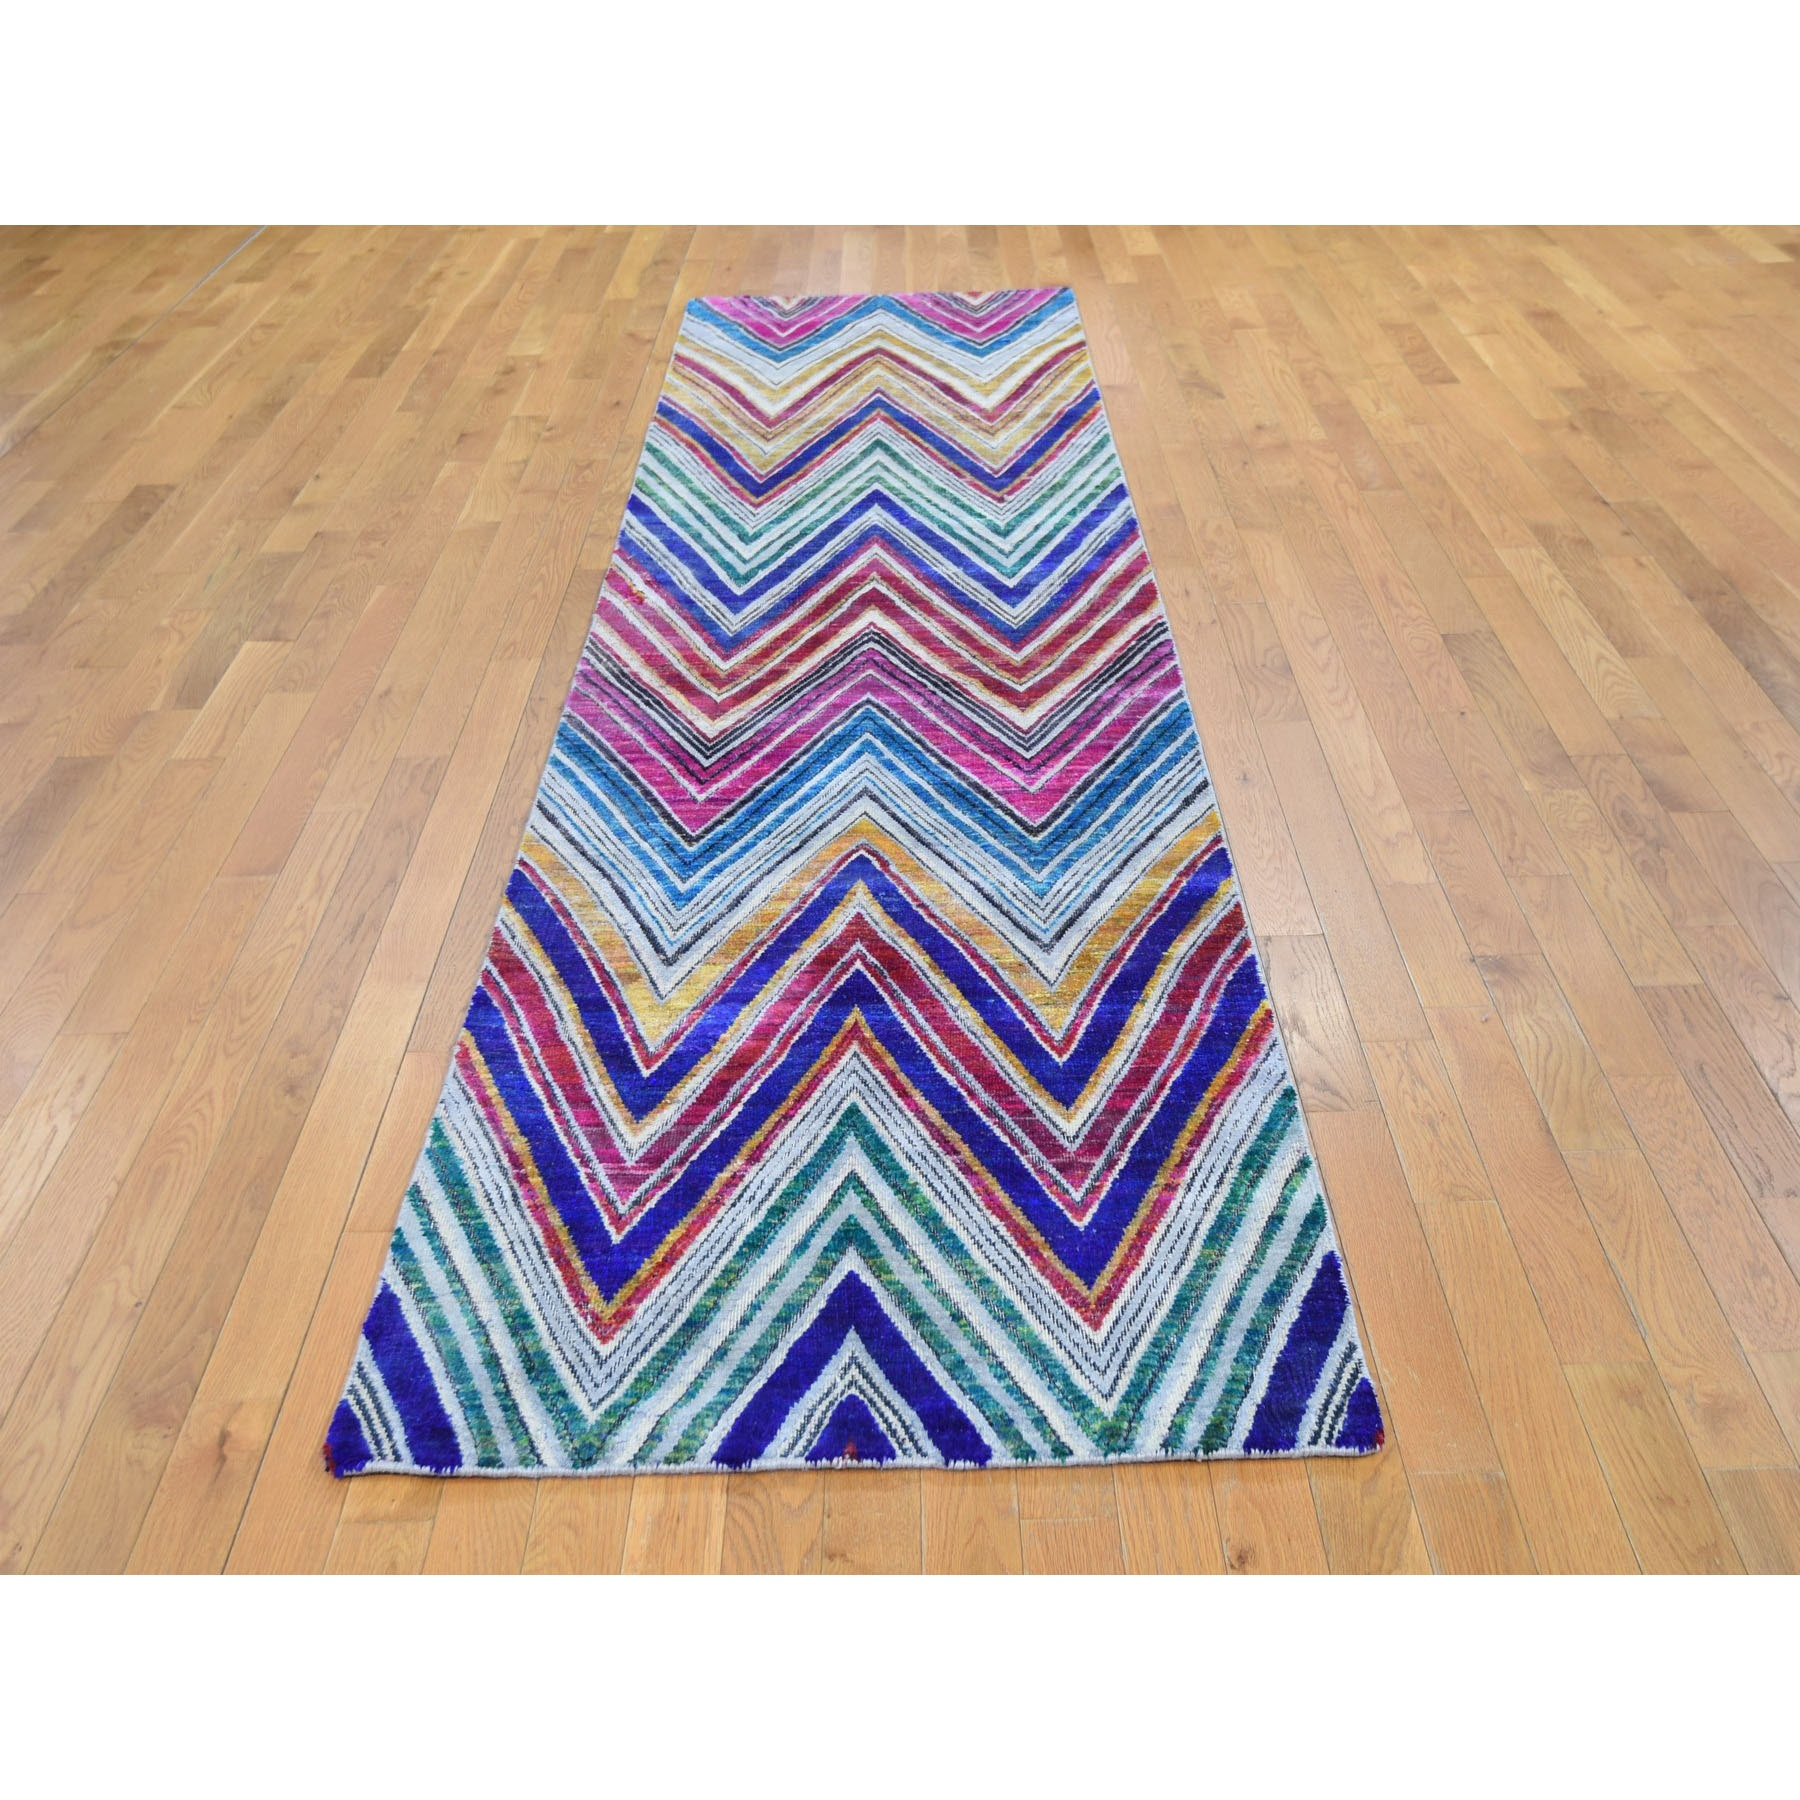 "3'x11'10"" Chevron Design Sari Silk and Textured Wool Hand Knotted Runner Oriental Rug"